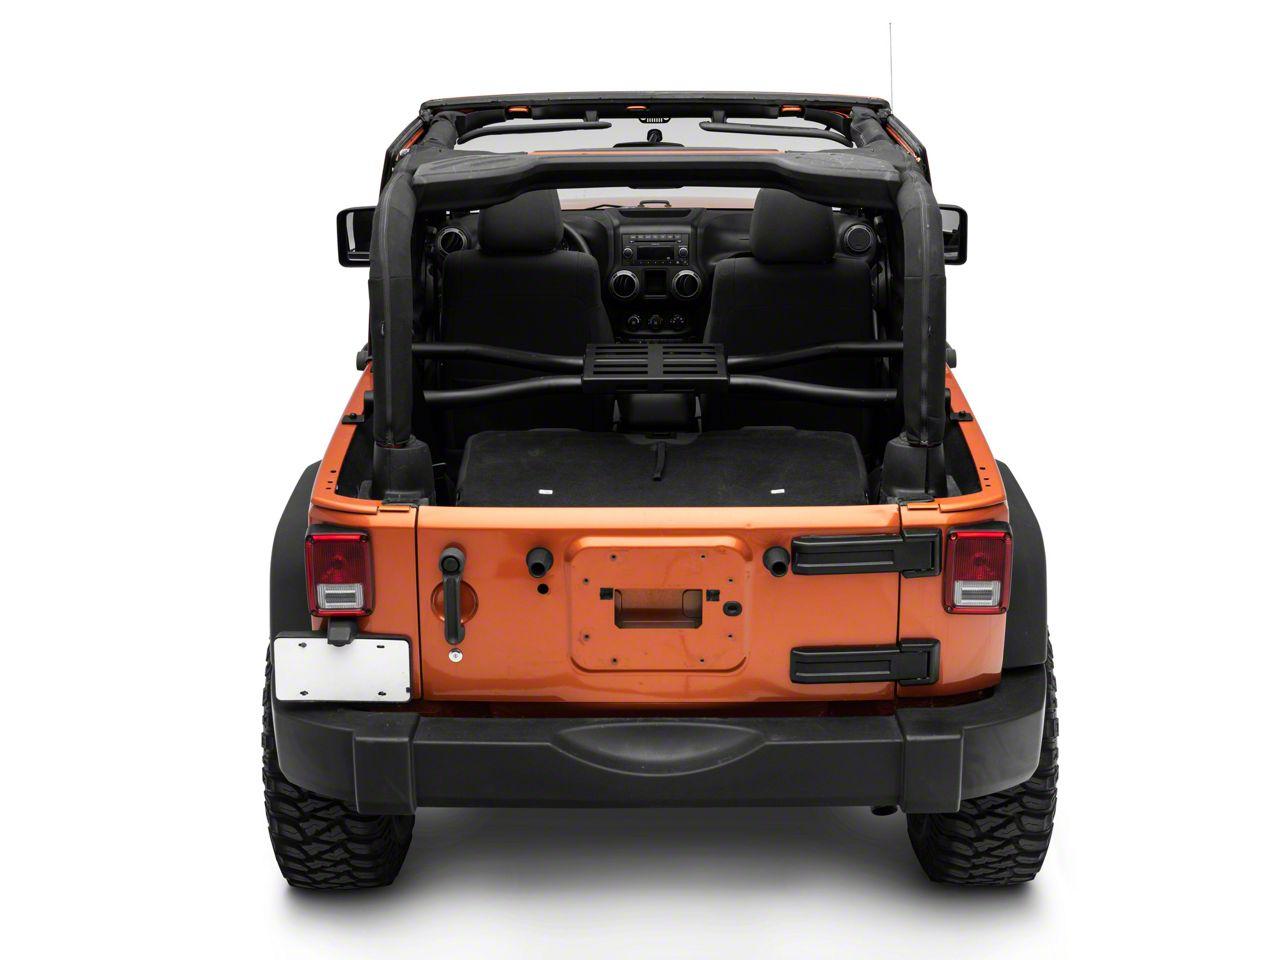 Suntop Spider Tire Rack (07-18 Jeep Wrangler JK)